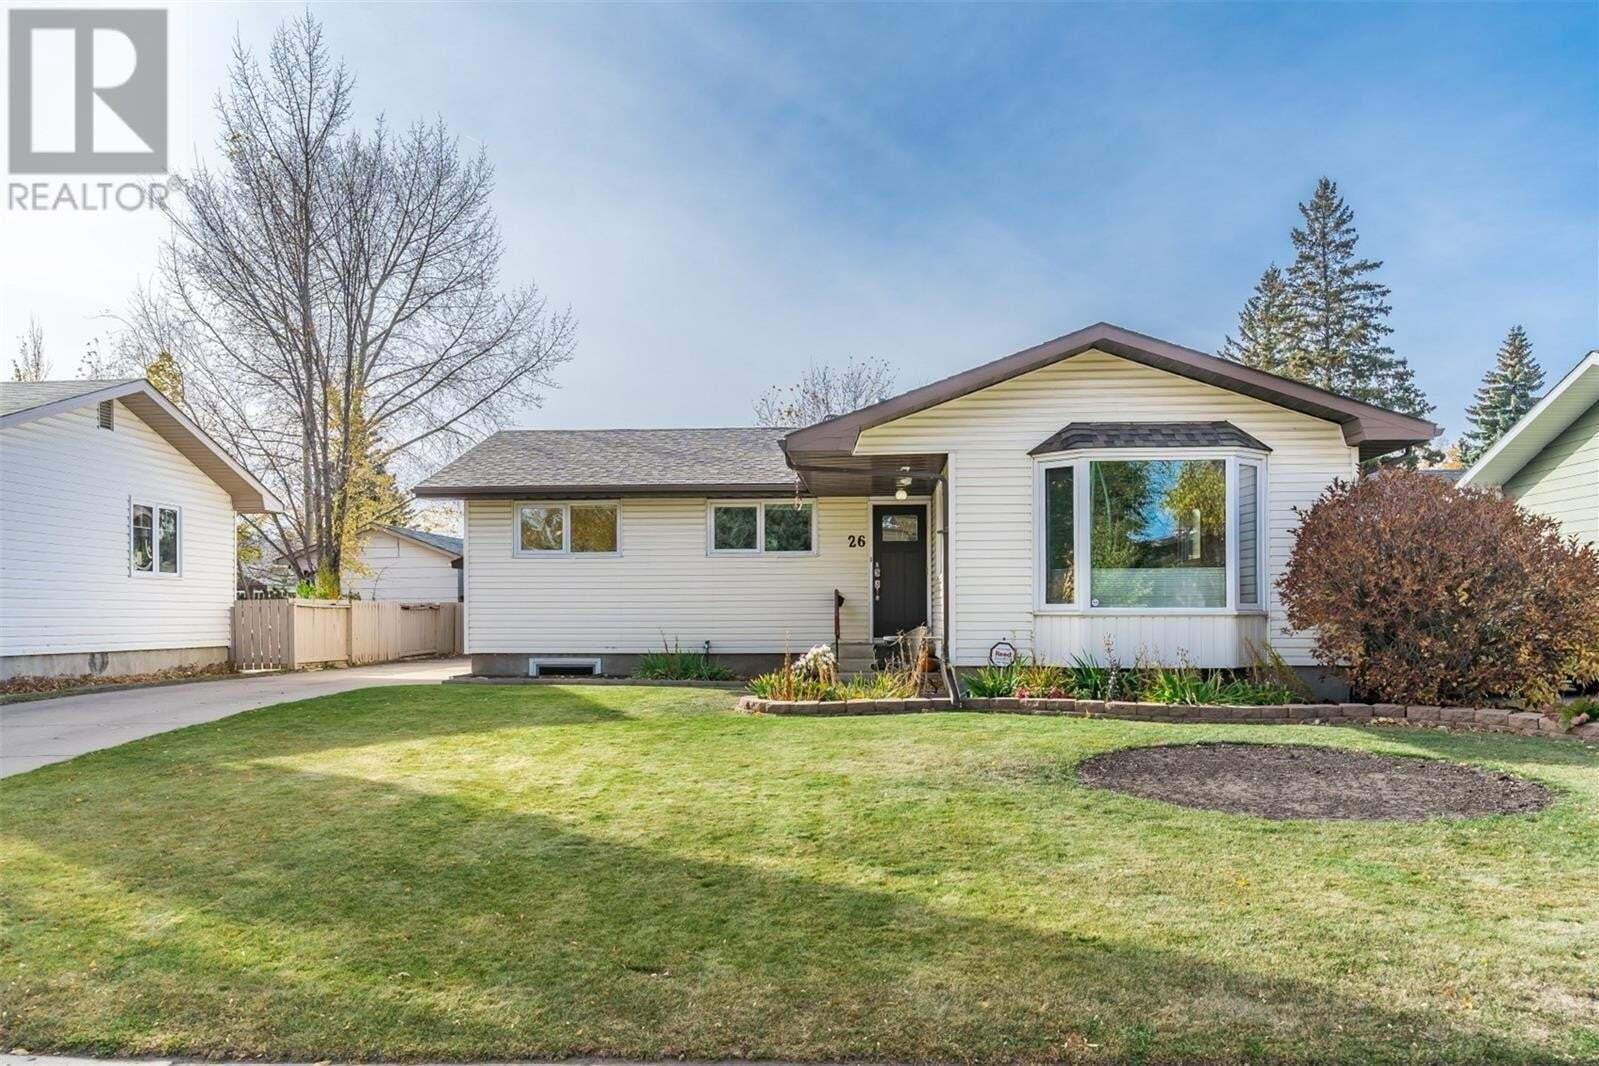 House for sale at 26 Middleton Cres Saskatoon Saskatchewan - MLS: SK831160